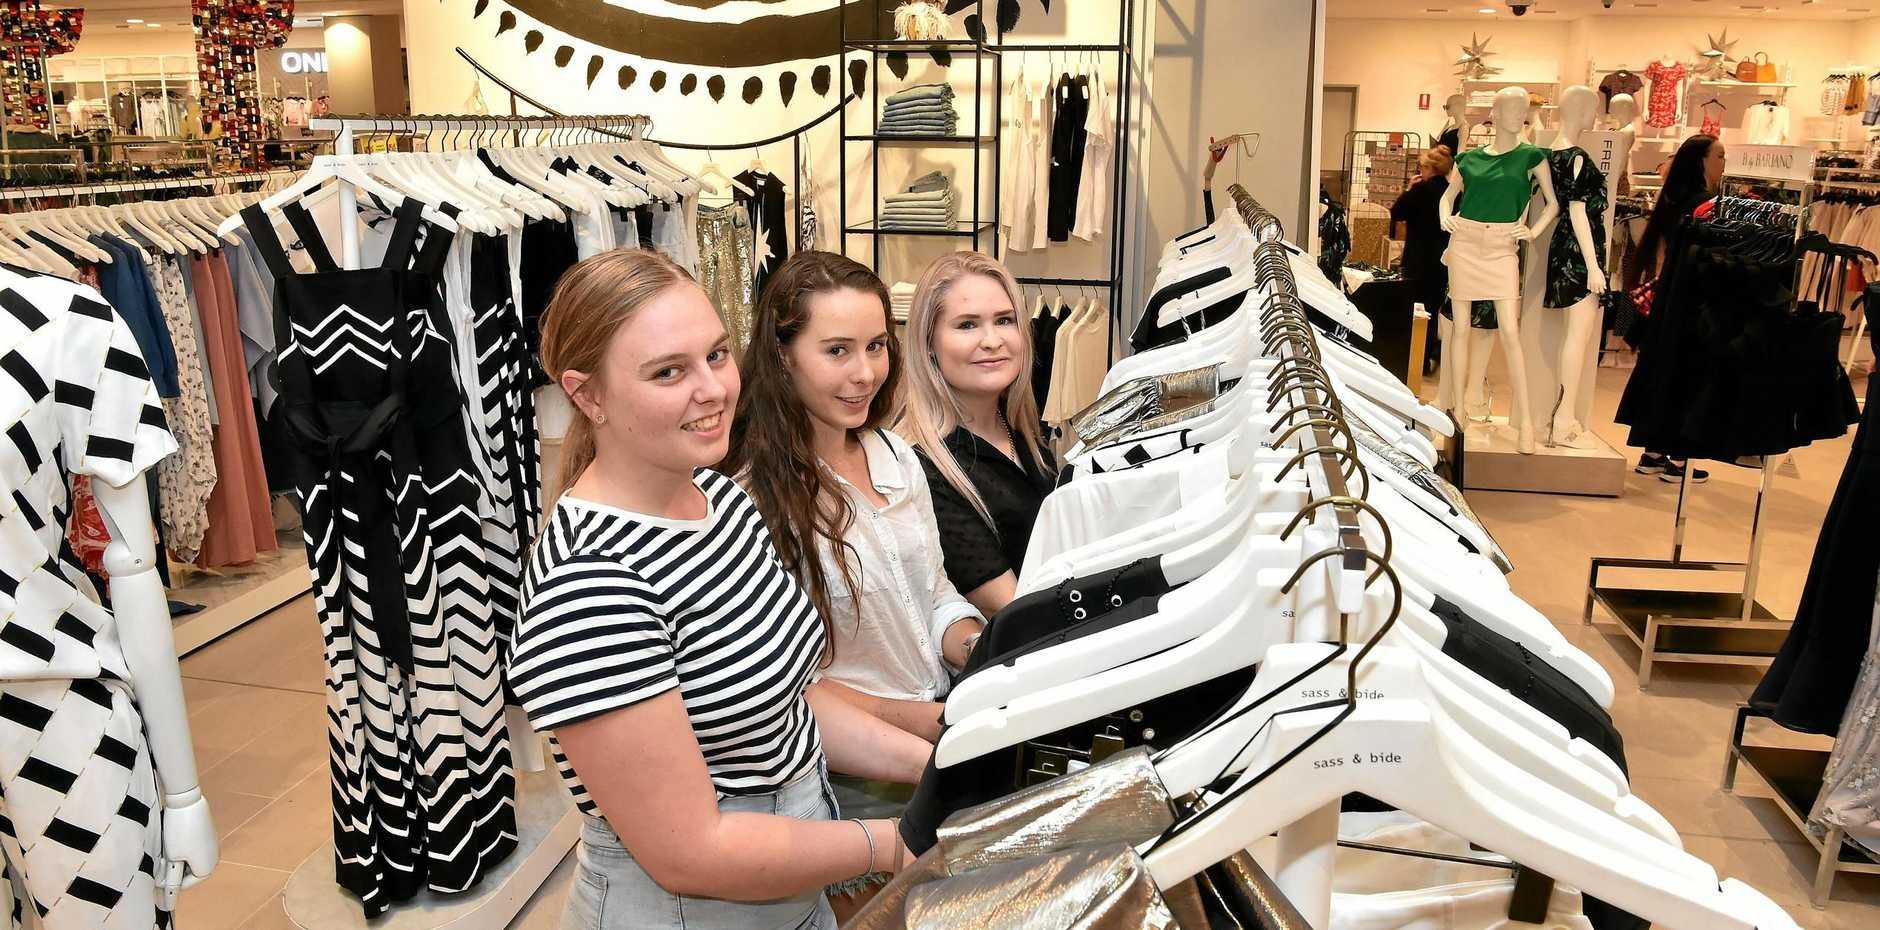 Mikaela Thompson, Nina Porteous and Syenna Rogerson enjoying the range of Sass & Bide clothes at the new-look Myer Maroochydore store.